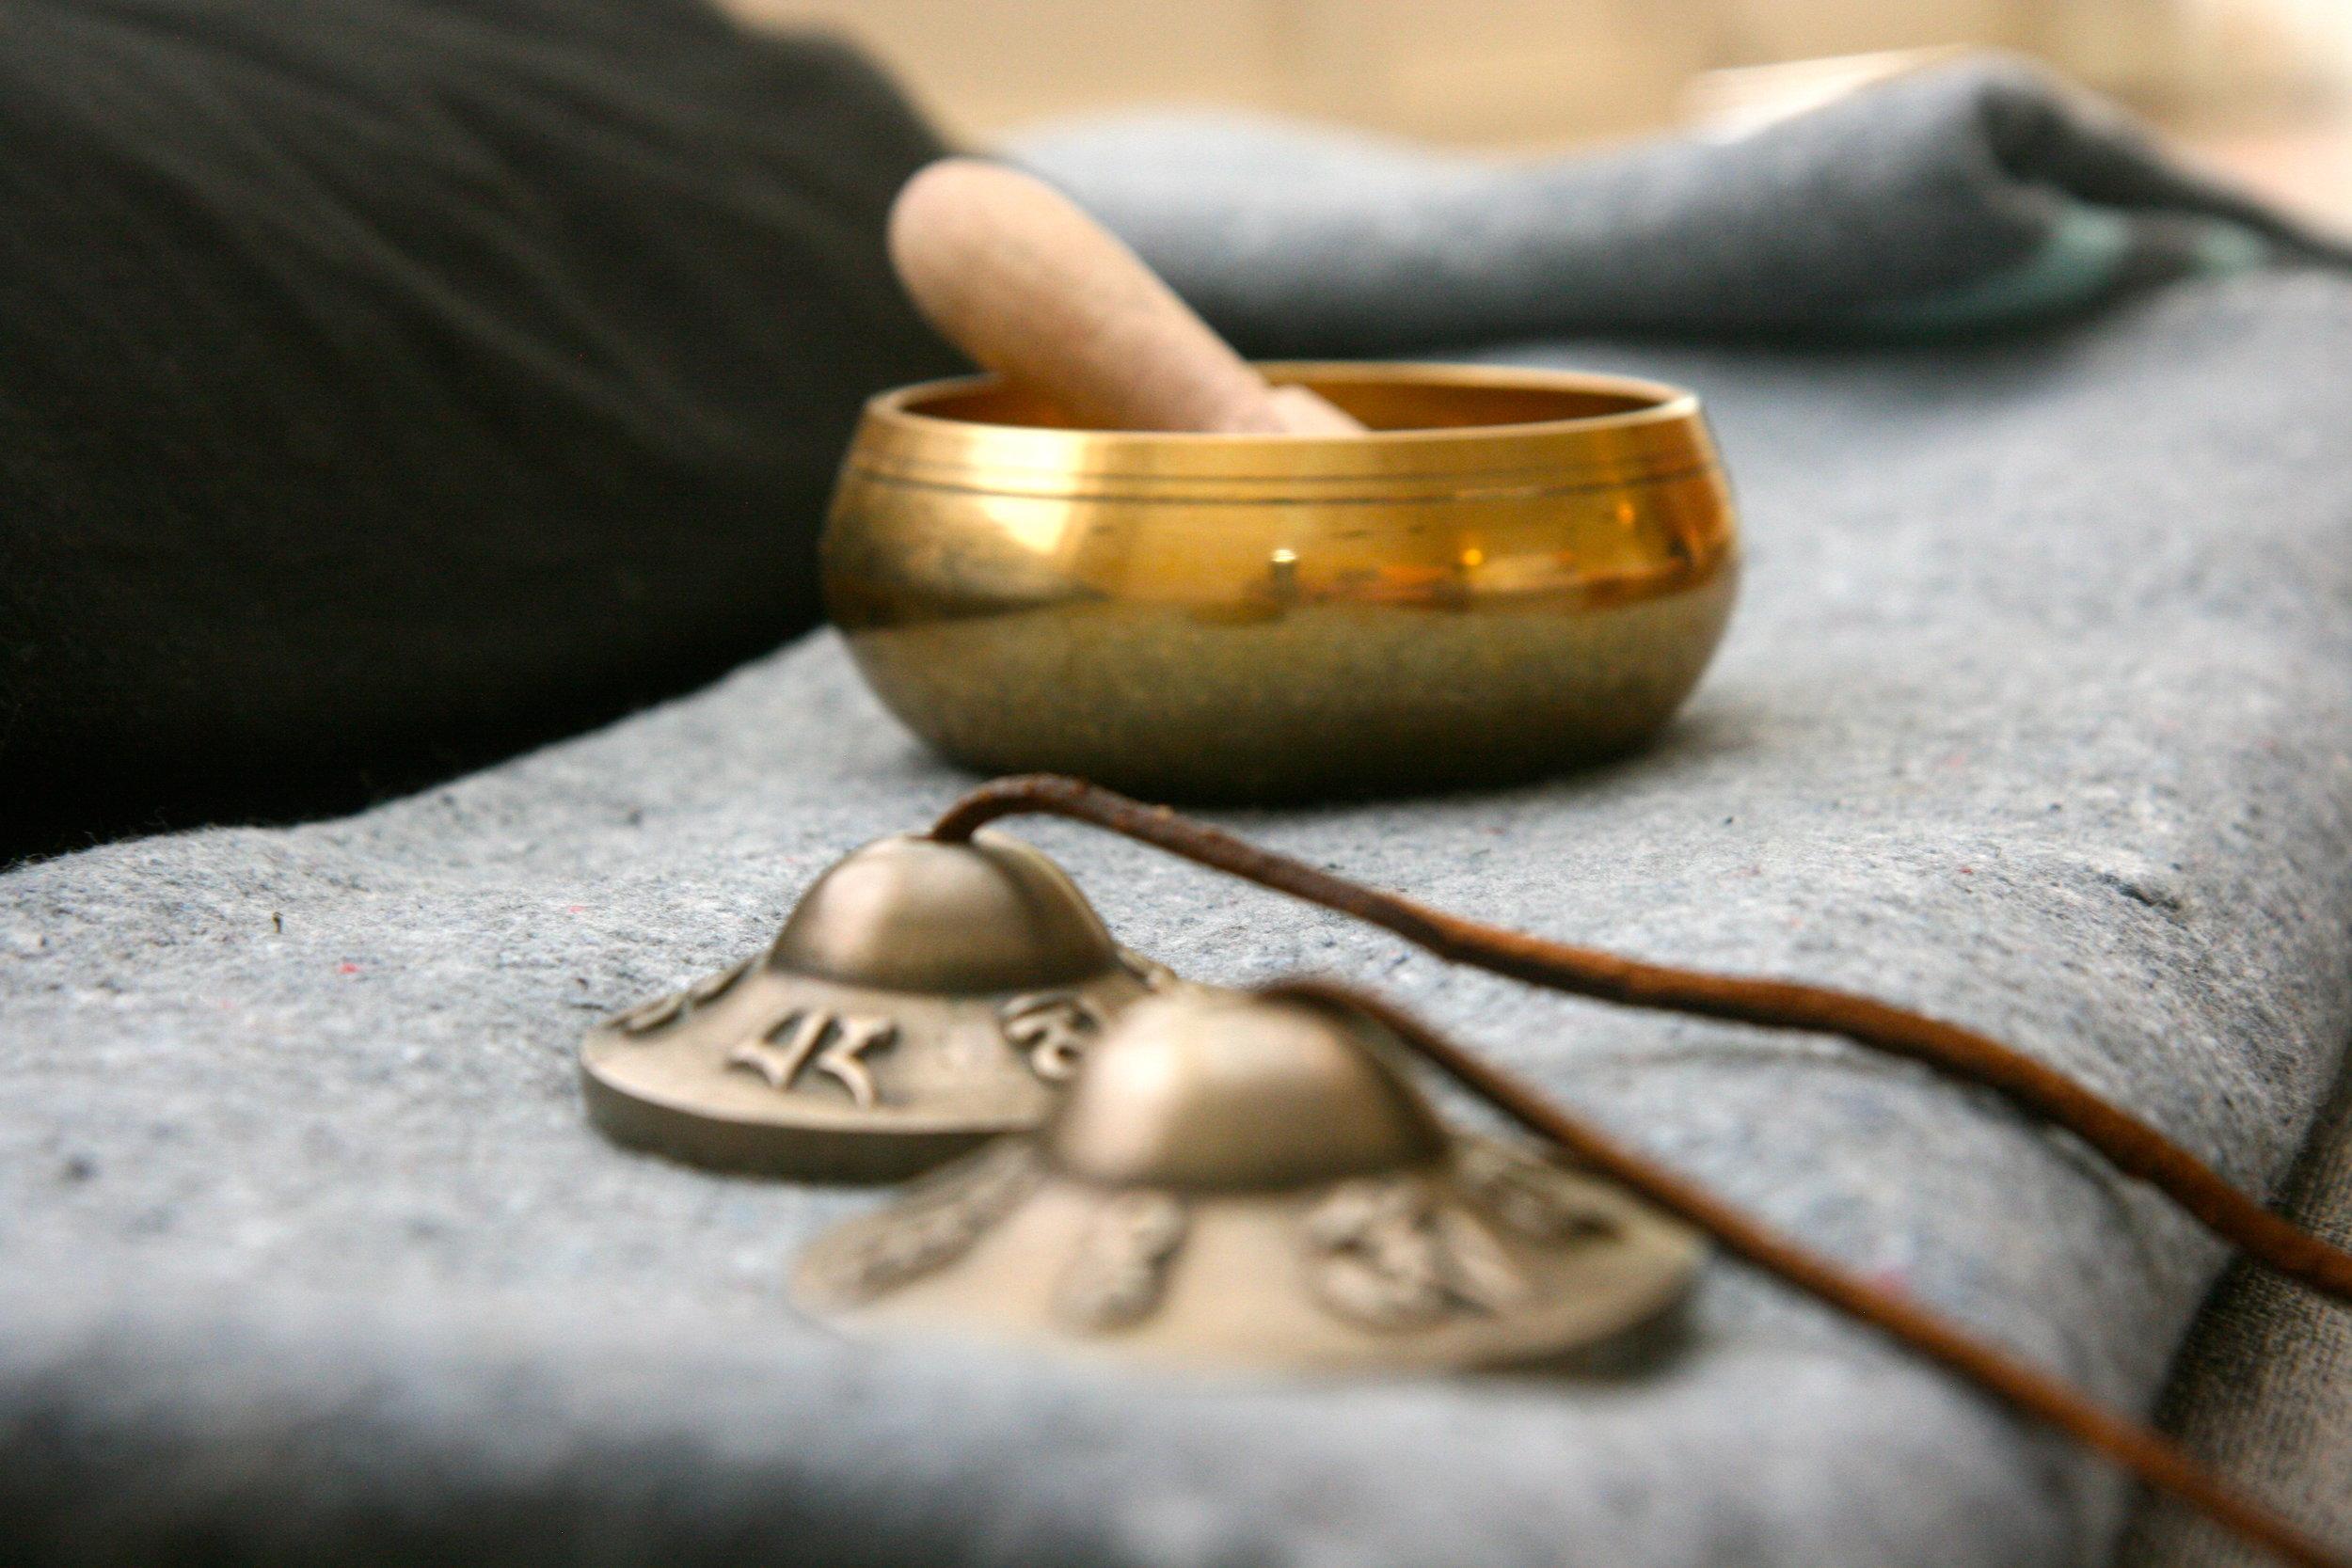 Meditation courses & retreats in The Gap